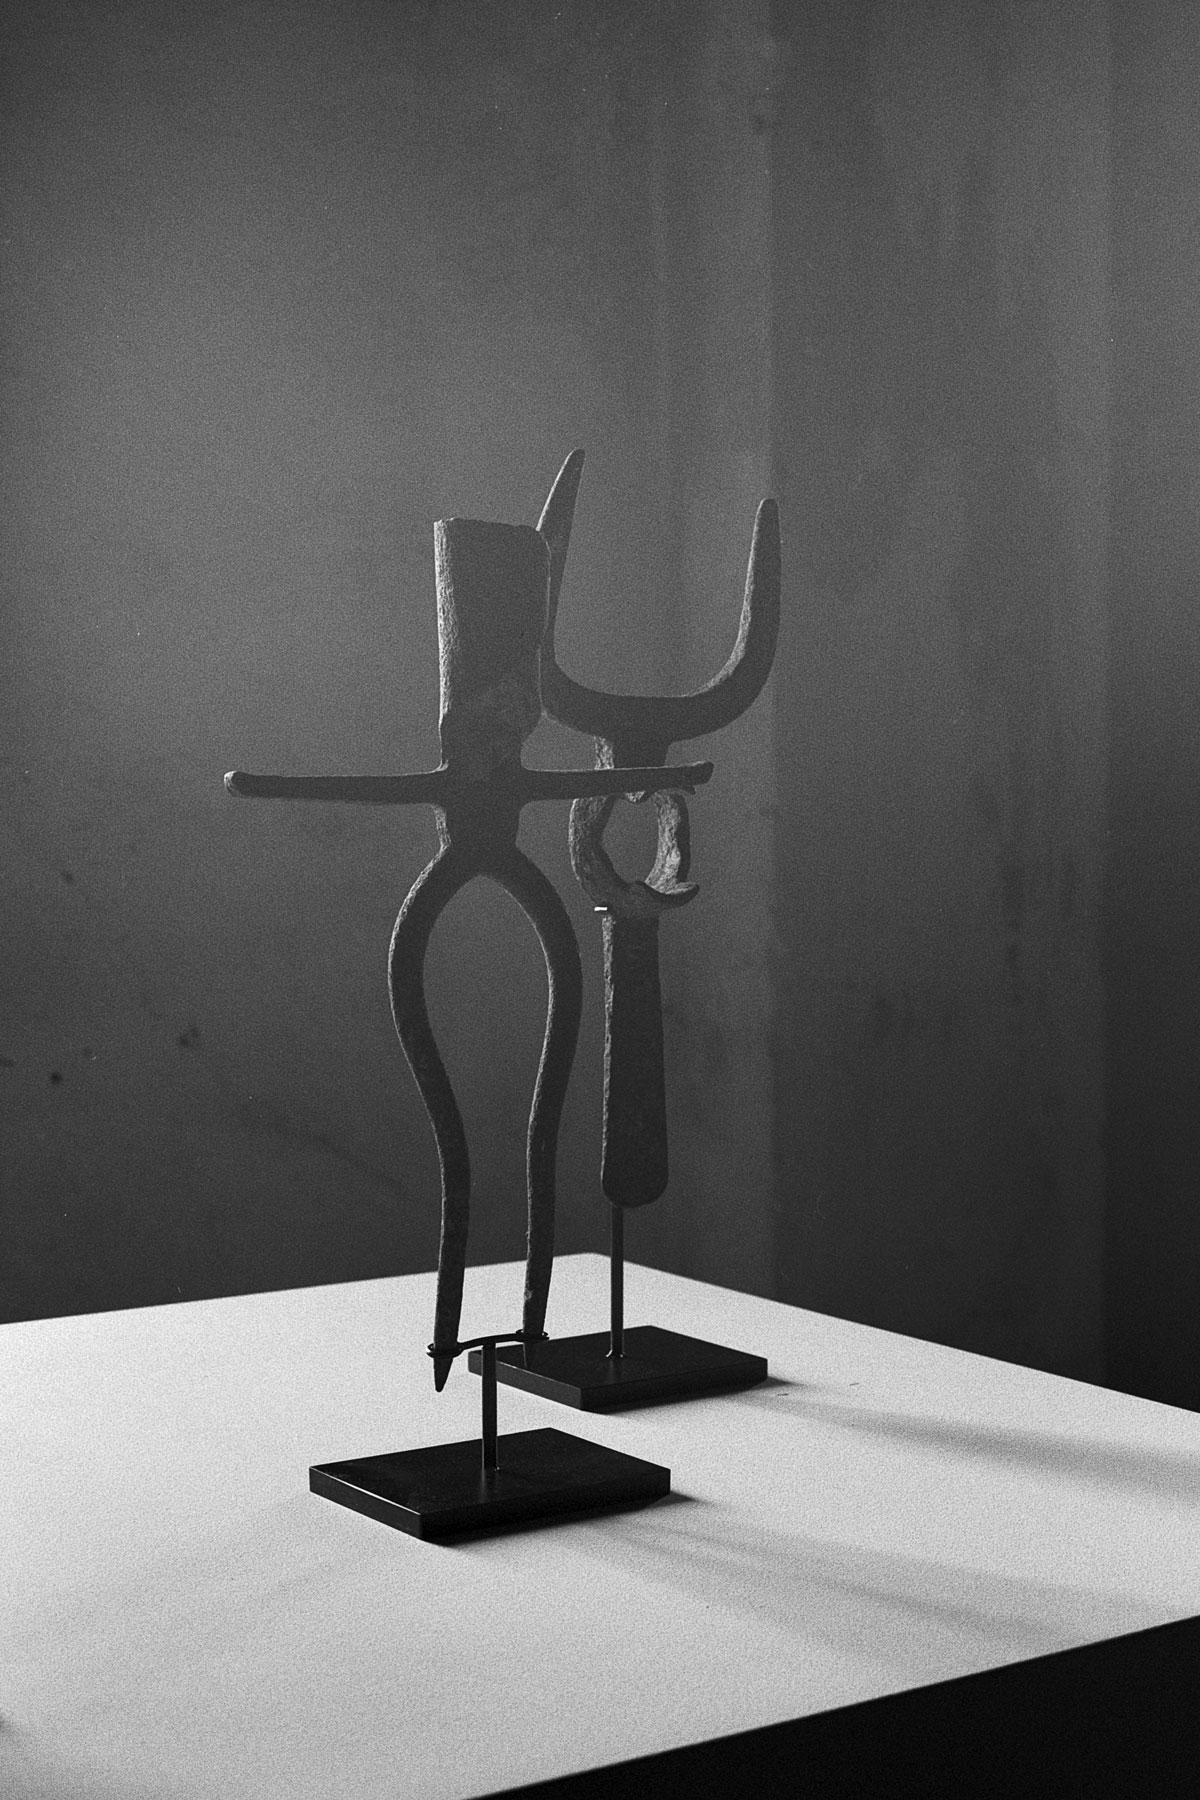 © Photograph by Marco Maria Zanin. 'Figure Femminile e Maschile' (2018) from Ritualia series. Silver gelatin print